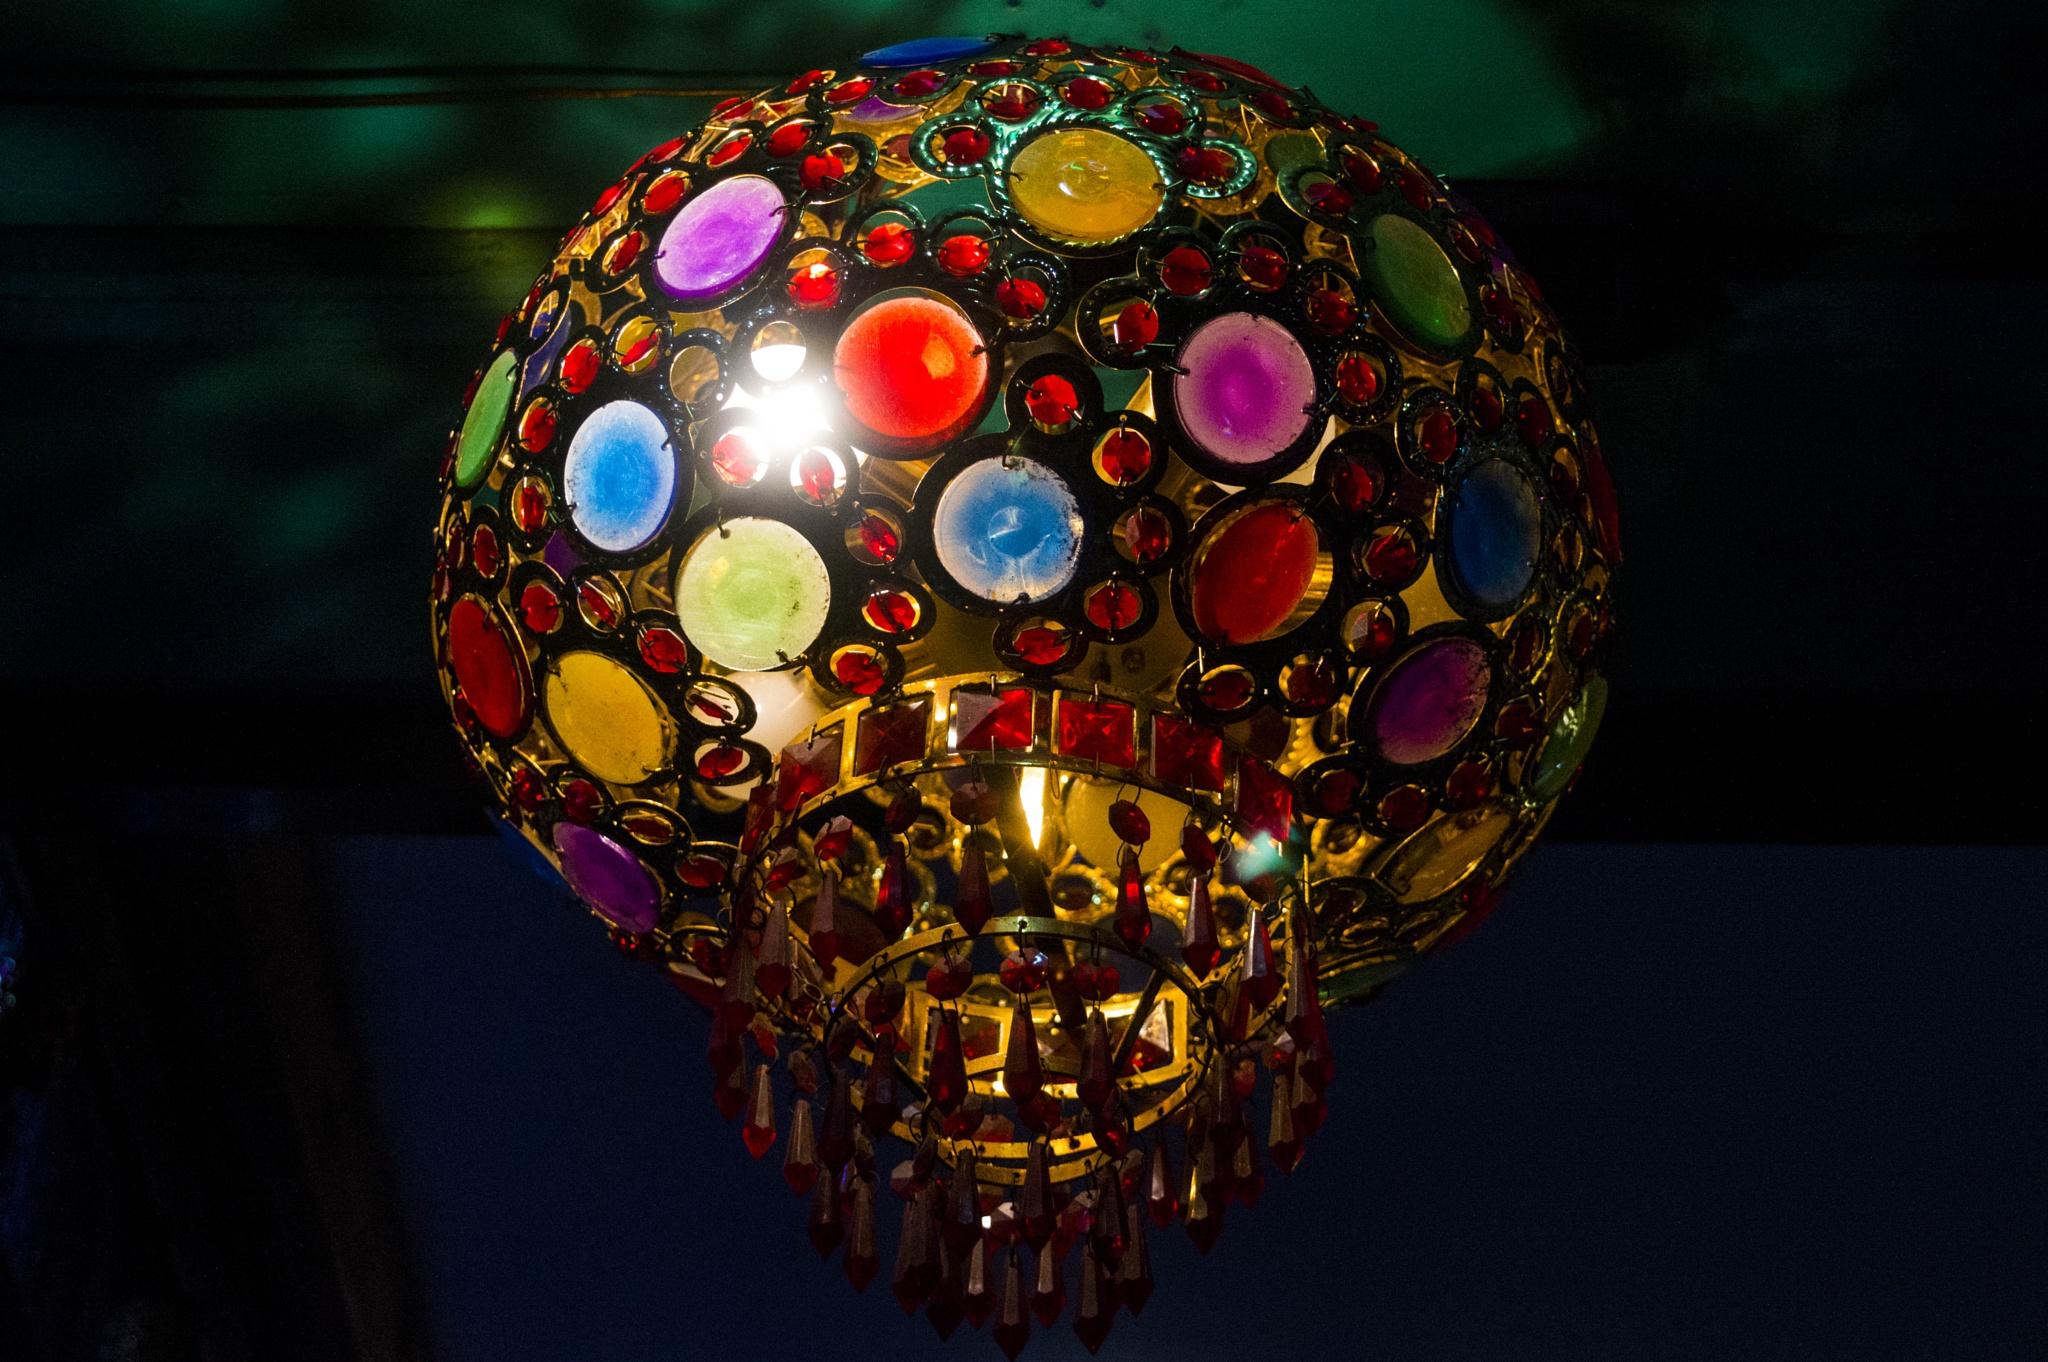 the globe by BearMan